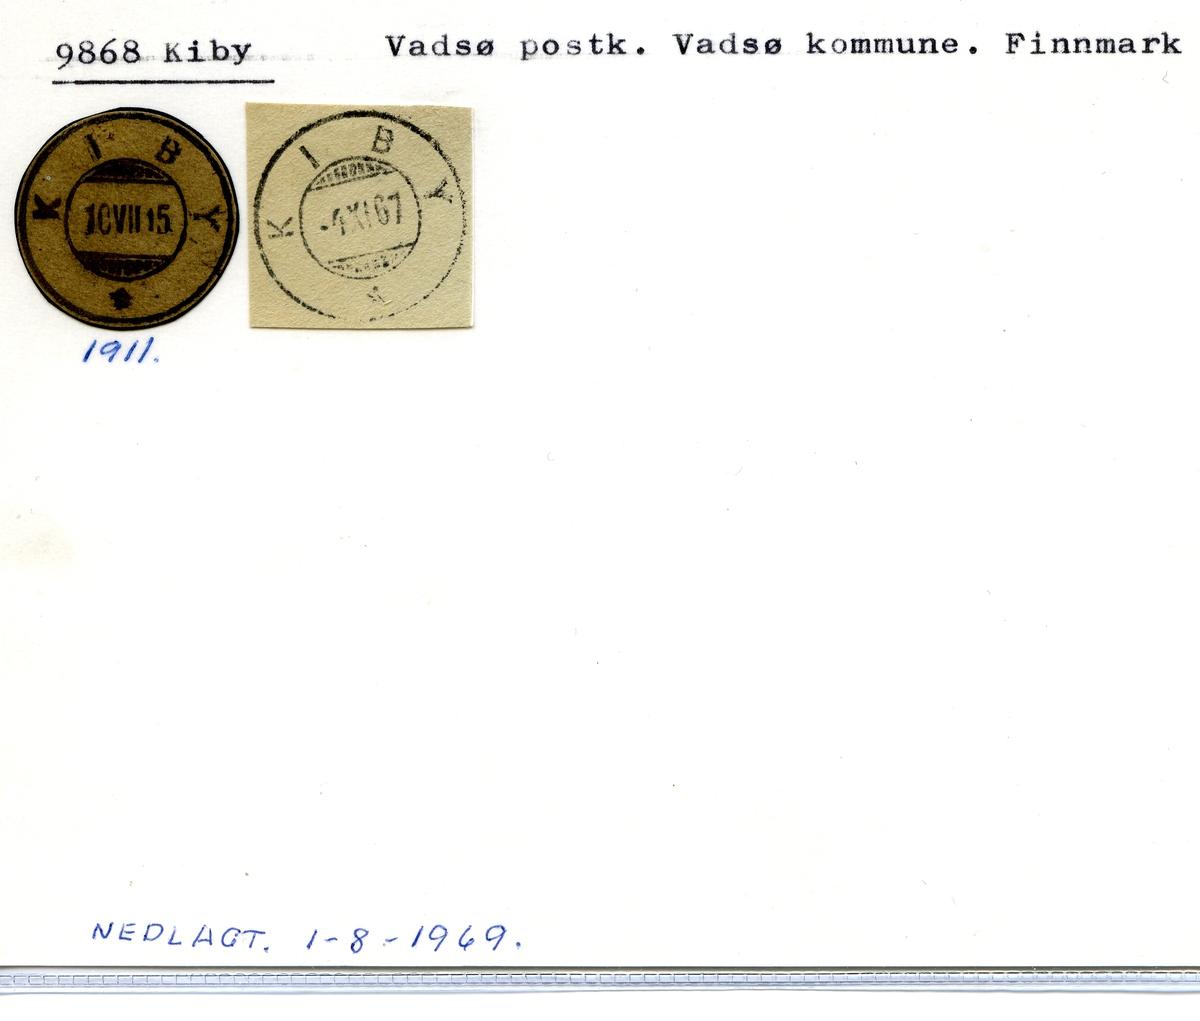 Stempelkatalog 9868 Kiby, Vadsø postk., Vadsø kommune, Finnmark